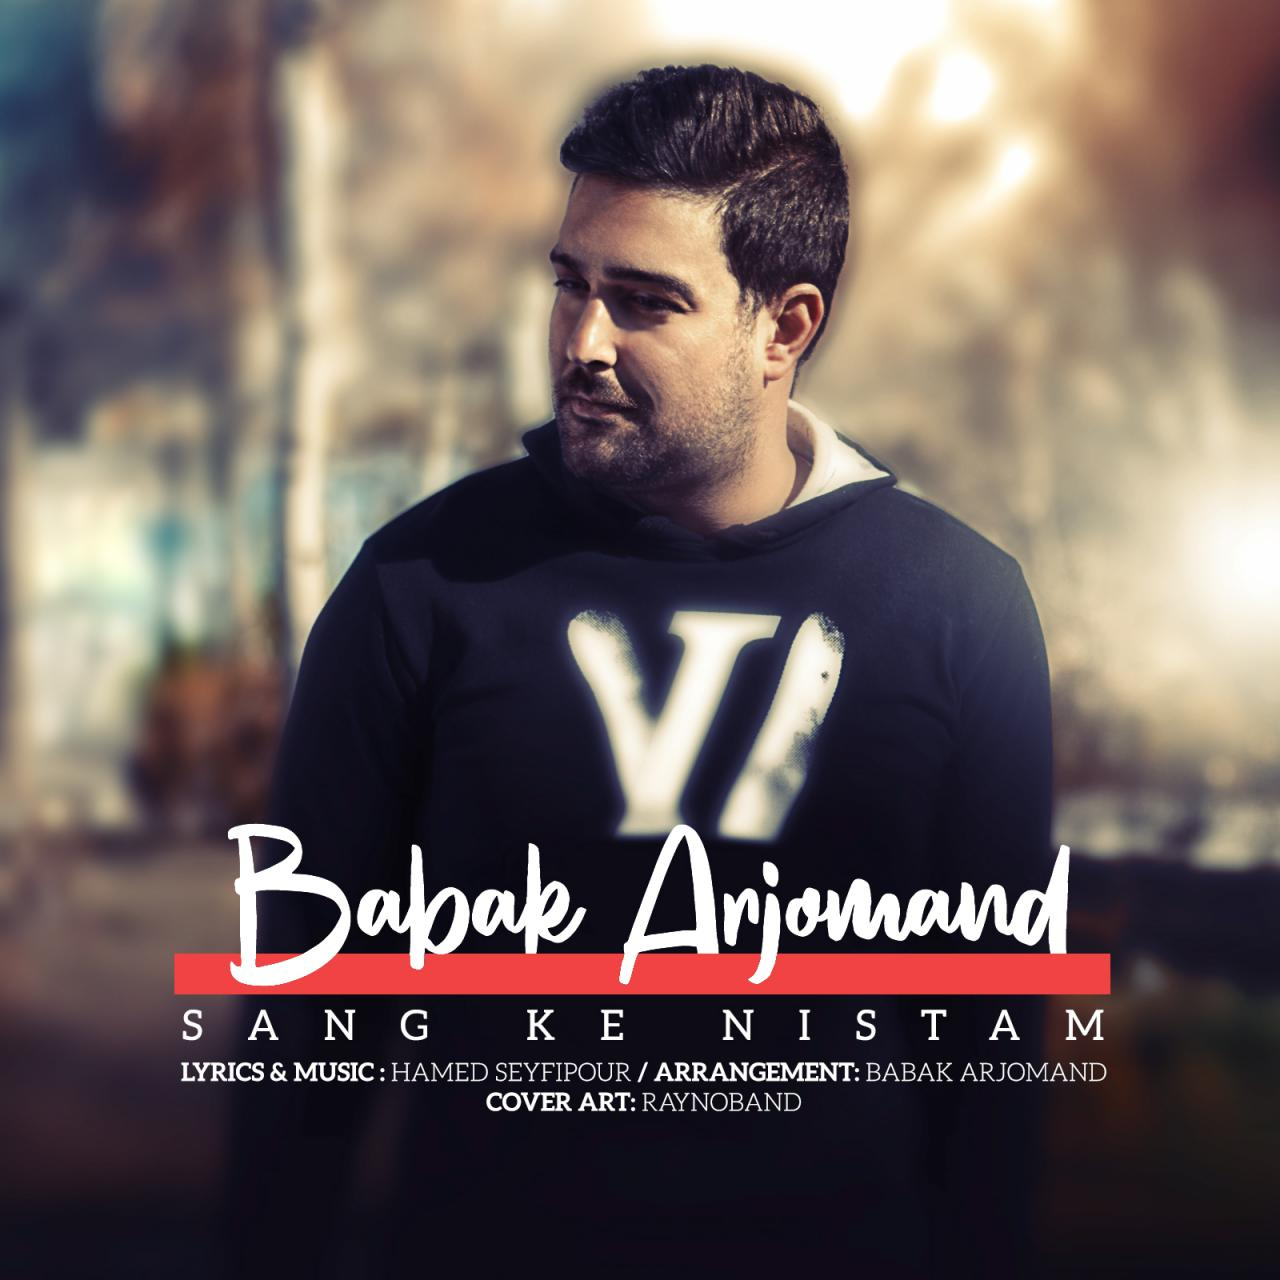 Babak Arjomand - Sang Ke Nistam Music | آهنگ  بابک ارجمند - سنگ که نیستم